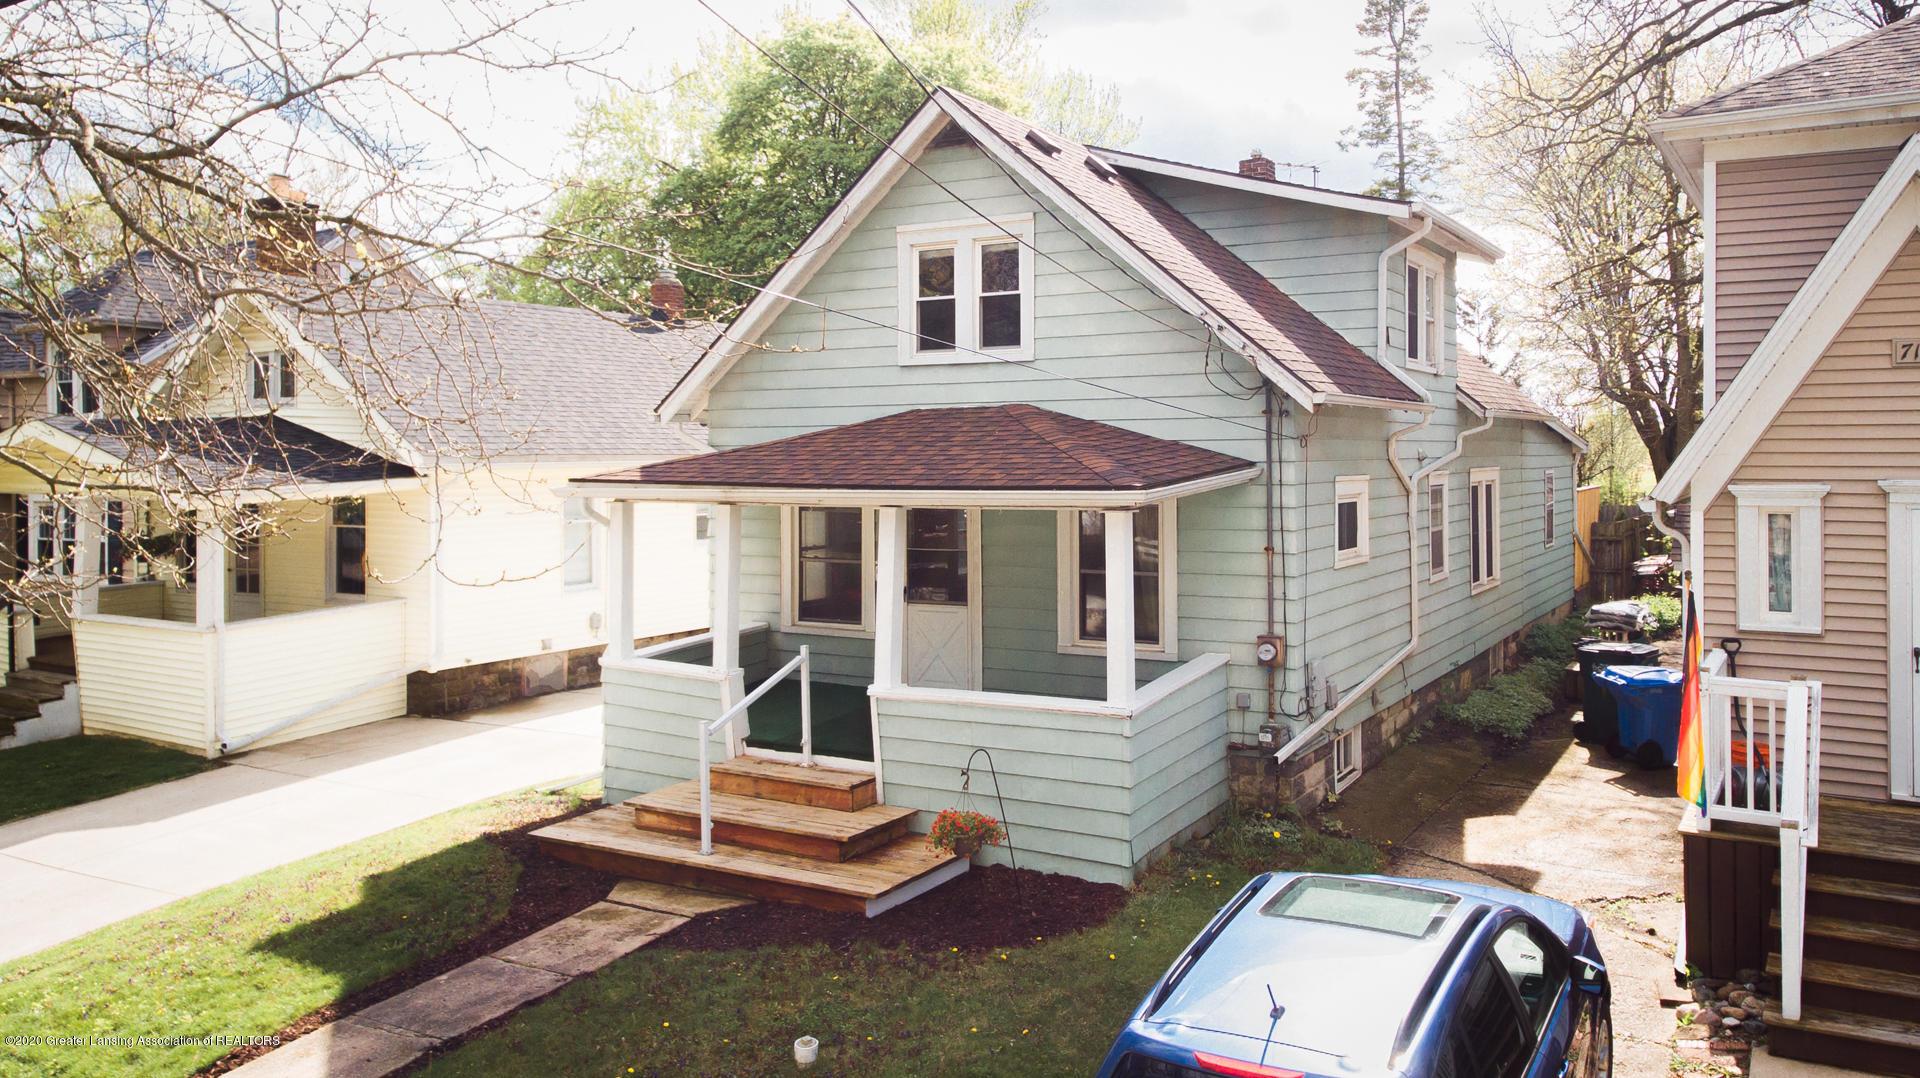 713 N Magnolia Ave - 713 N. Magnolia - 1